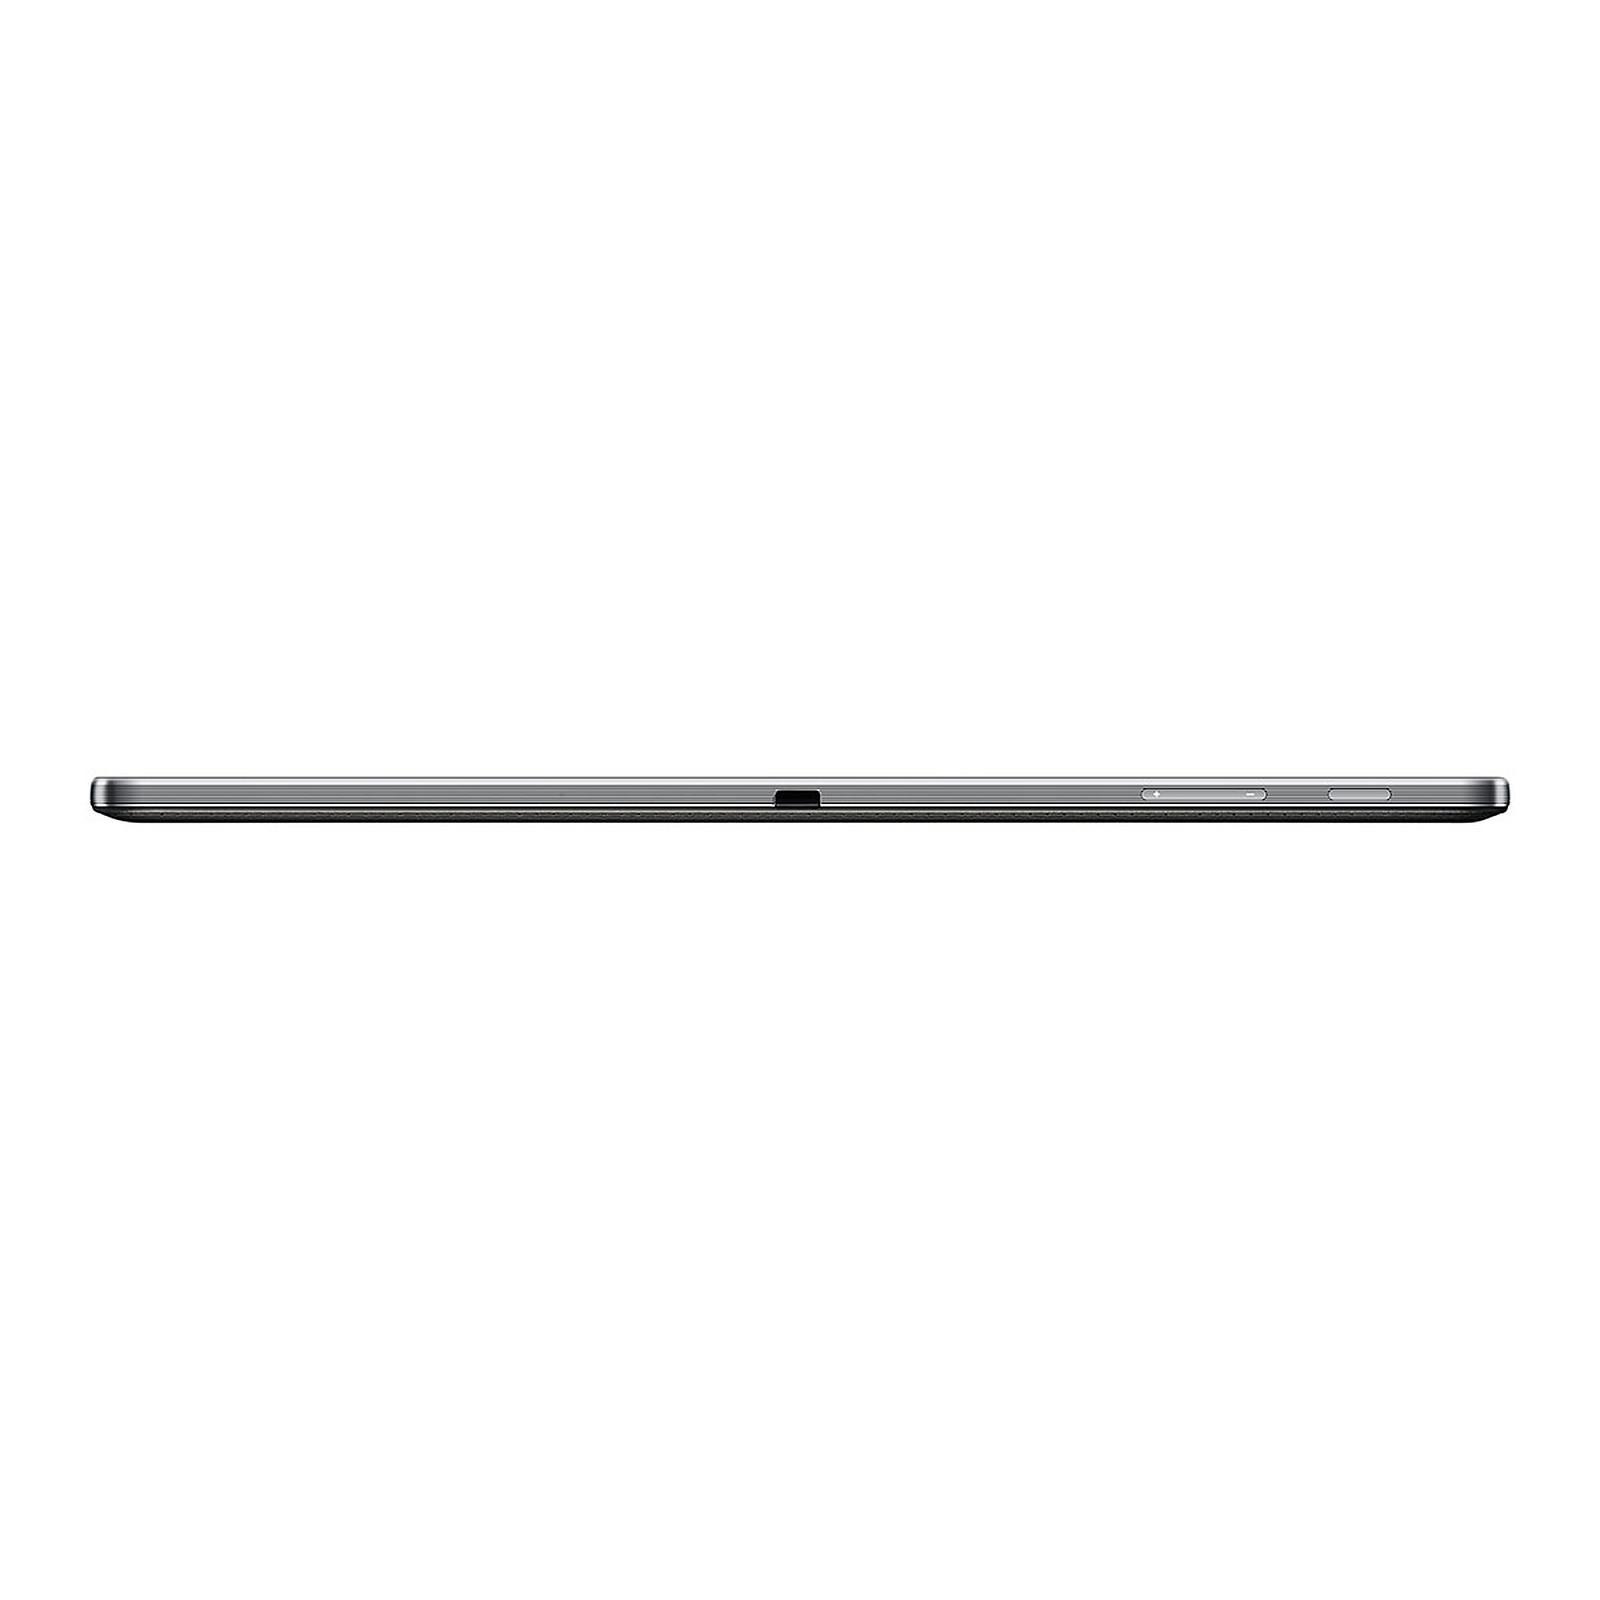 Galaxy Note 10.1 (2014) - WiFi